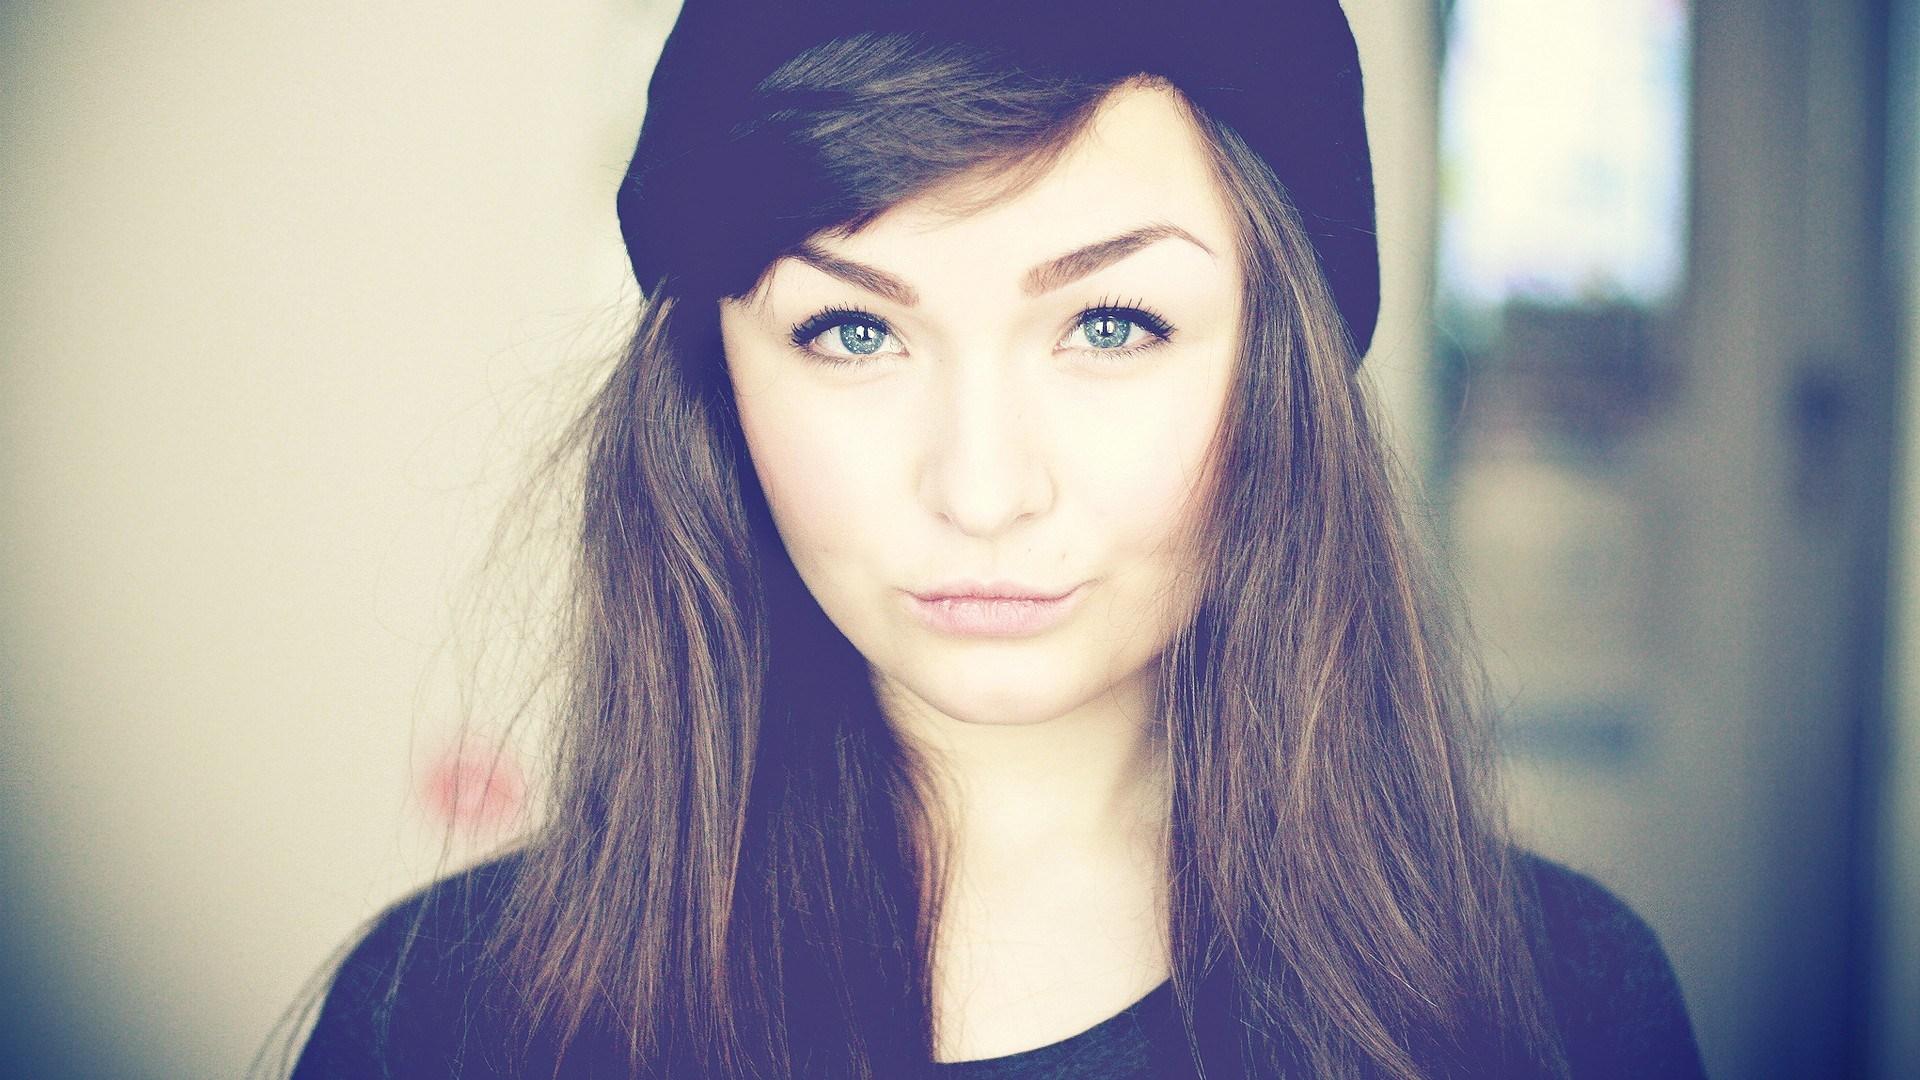 Portrait Girl Beauty Face